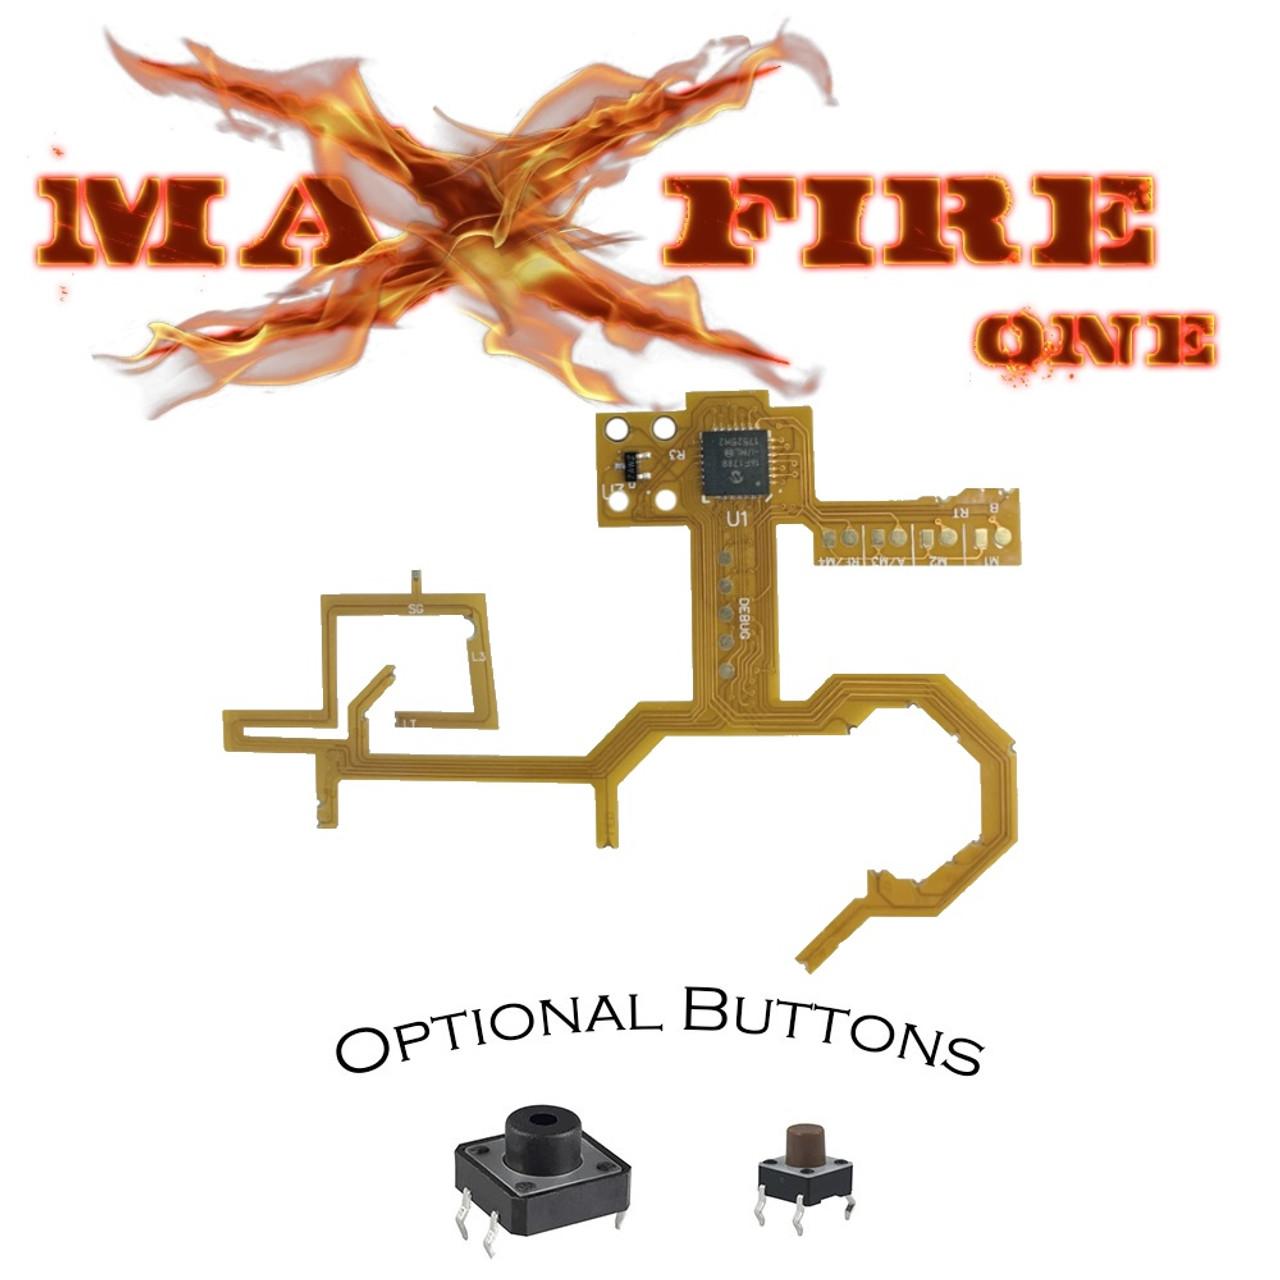 Xbox One MAXFIRE-REFLEX V4S button remapping flex mod